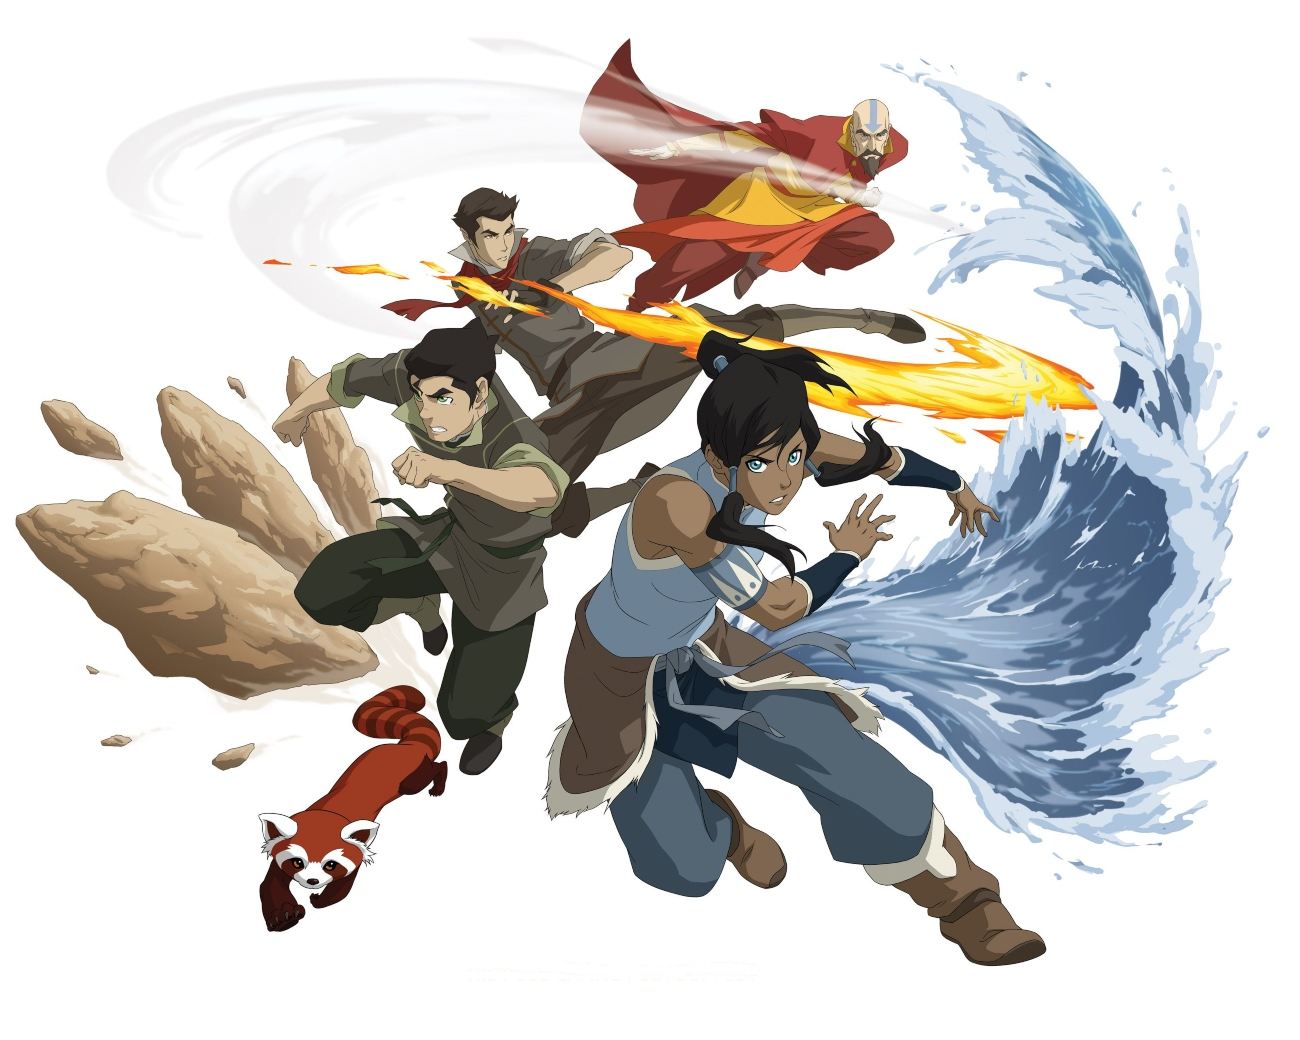 Bolin, Mako, Aang, and Korra of The Legend of Korra